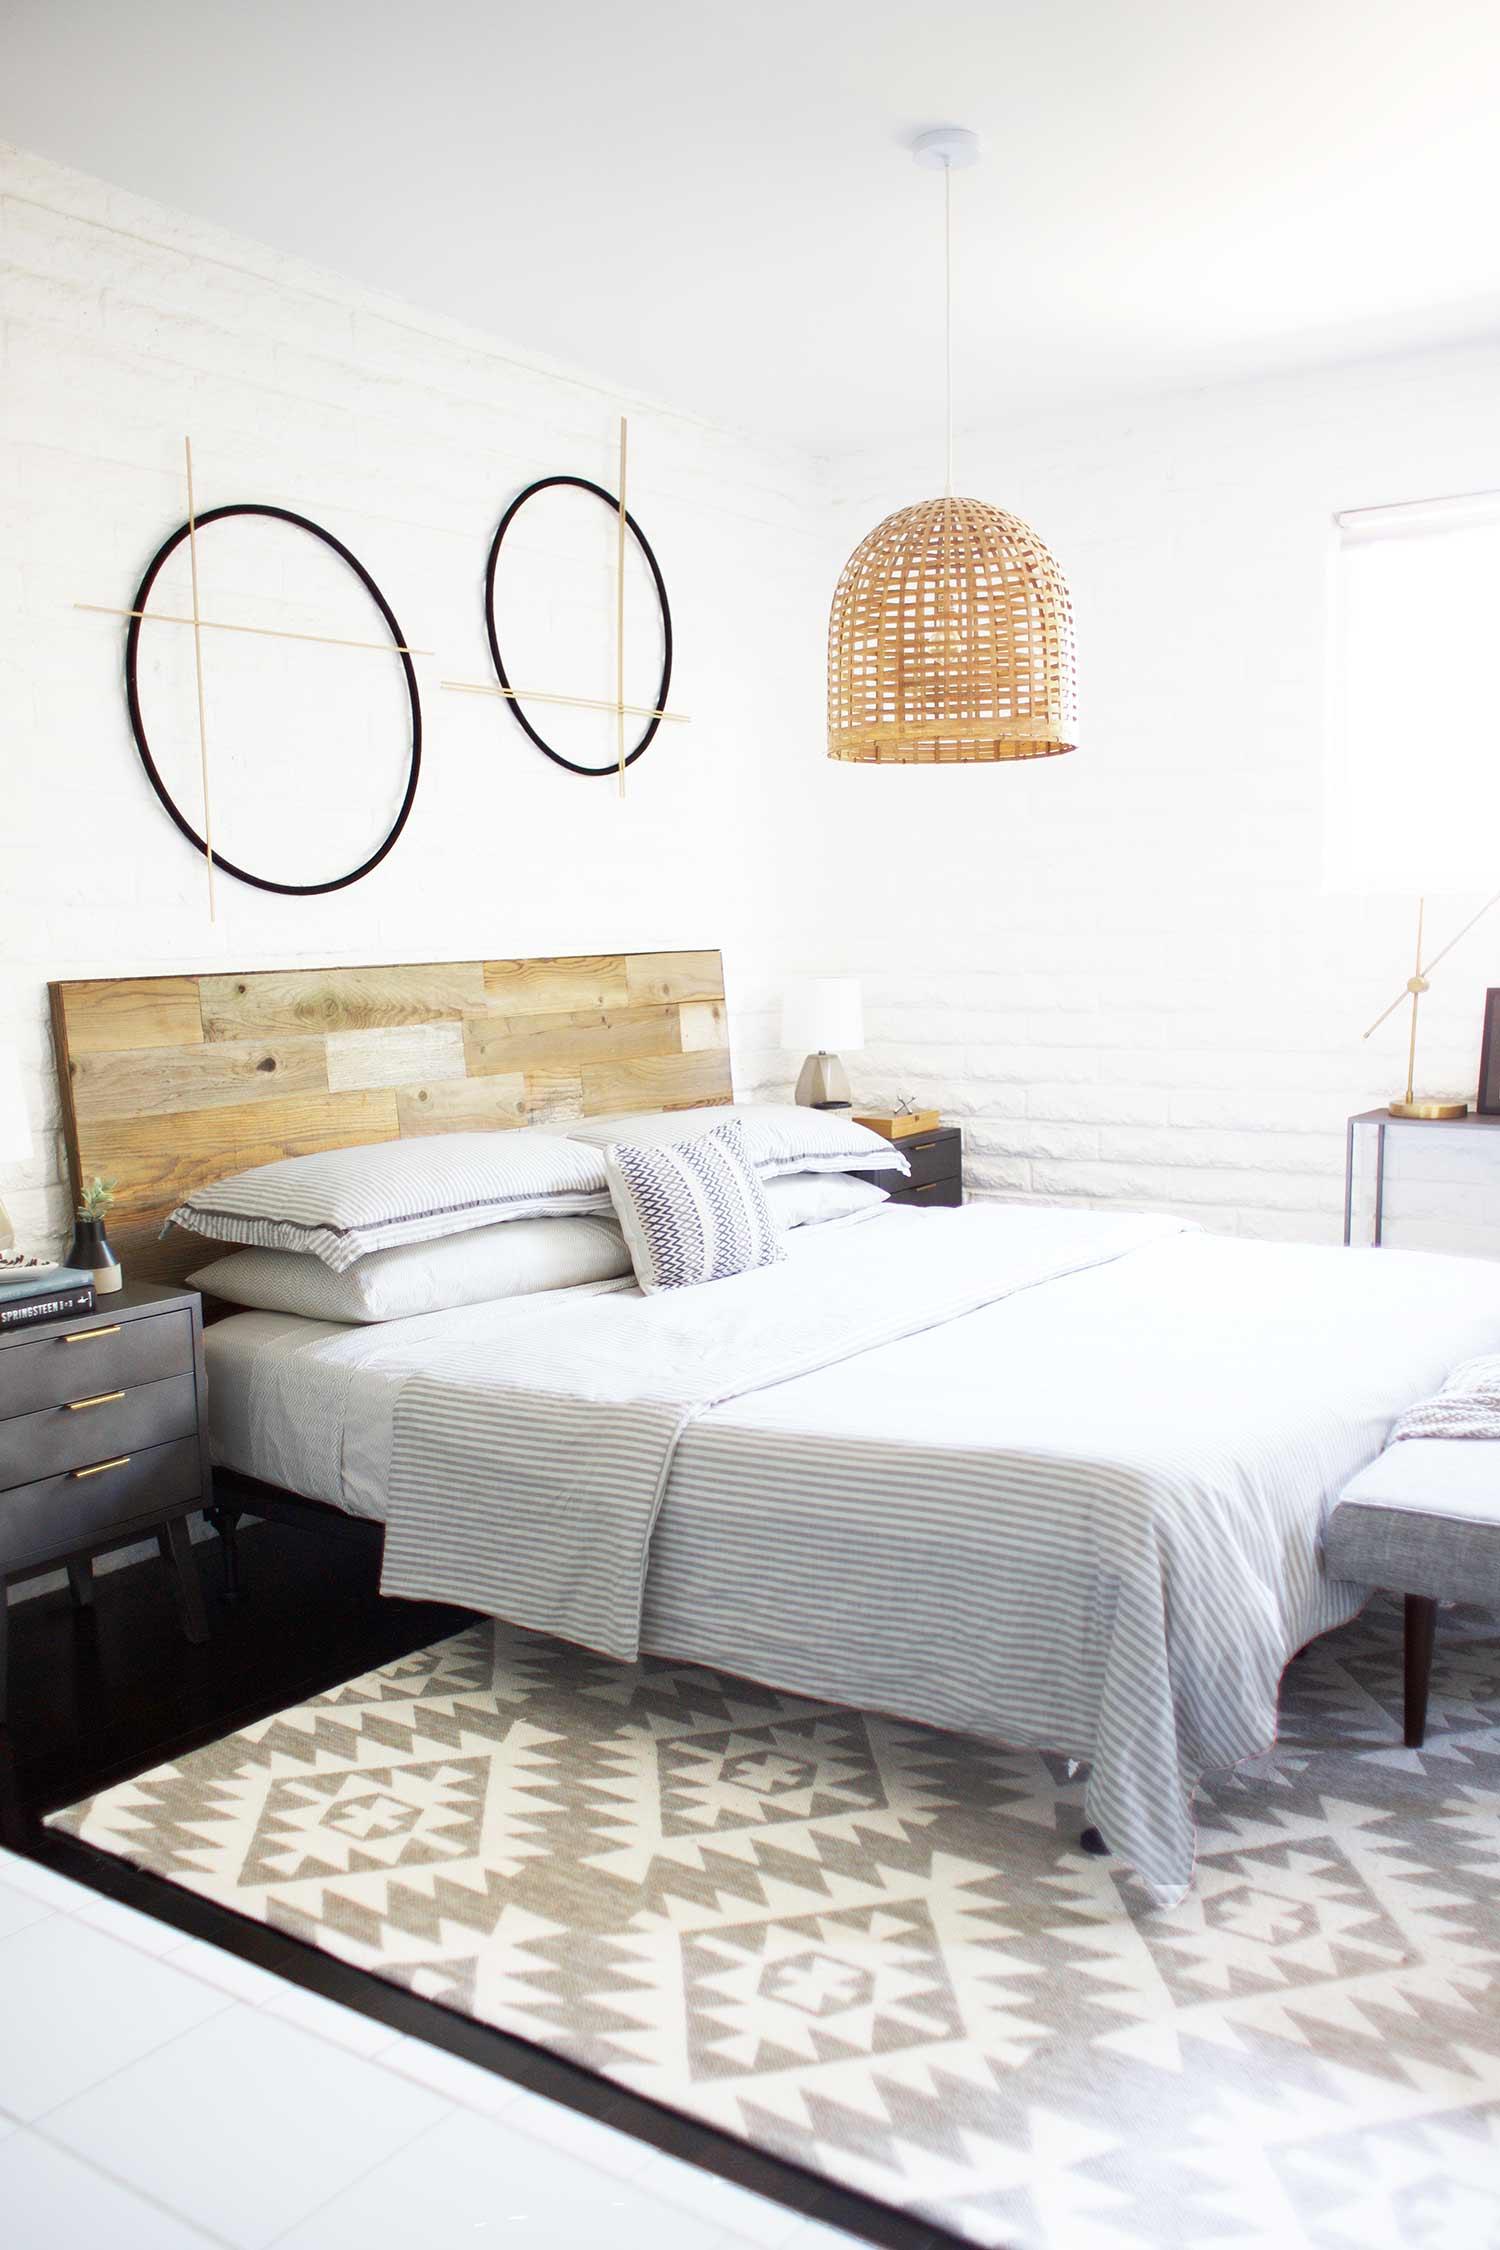 20 Minute DIY Reclaimed Wood Headboard — Kristi Murphy   DIY Blog